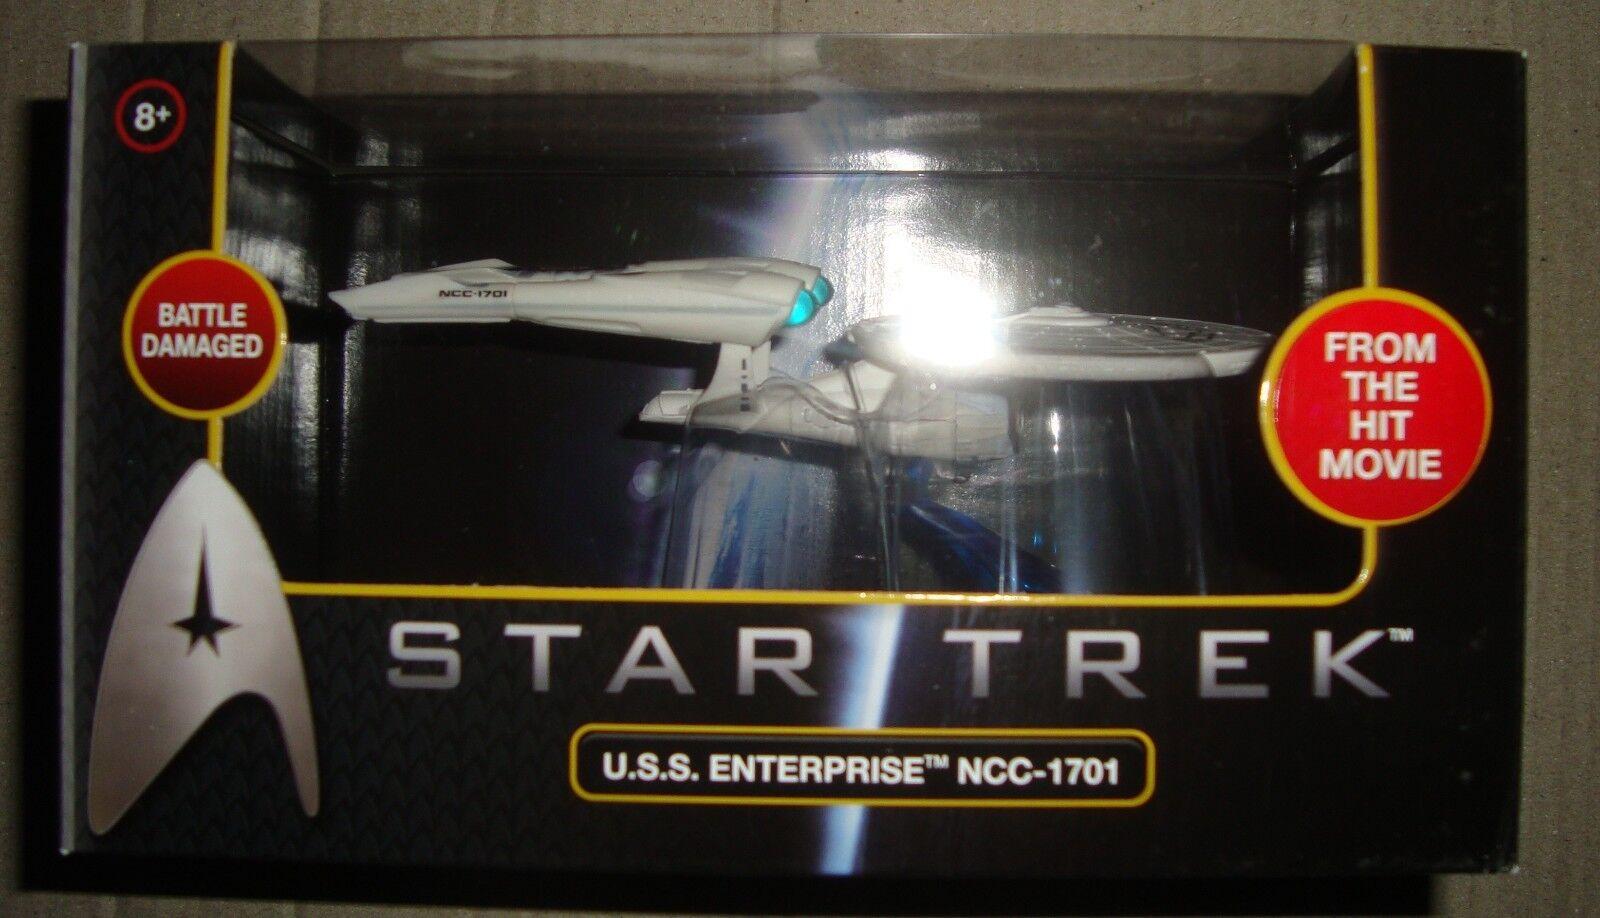 HUVUDHUS stjärna TREK U.S.ENTERPRISE NCC -1701 slåss DAGAD HIT MOVEL MATEL